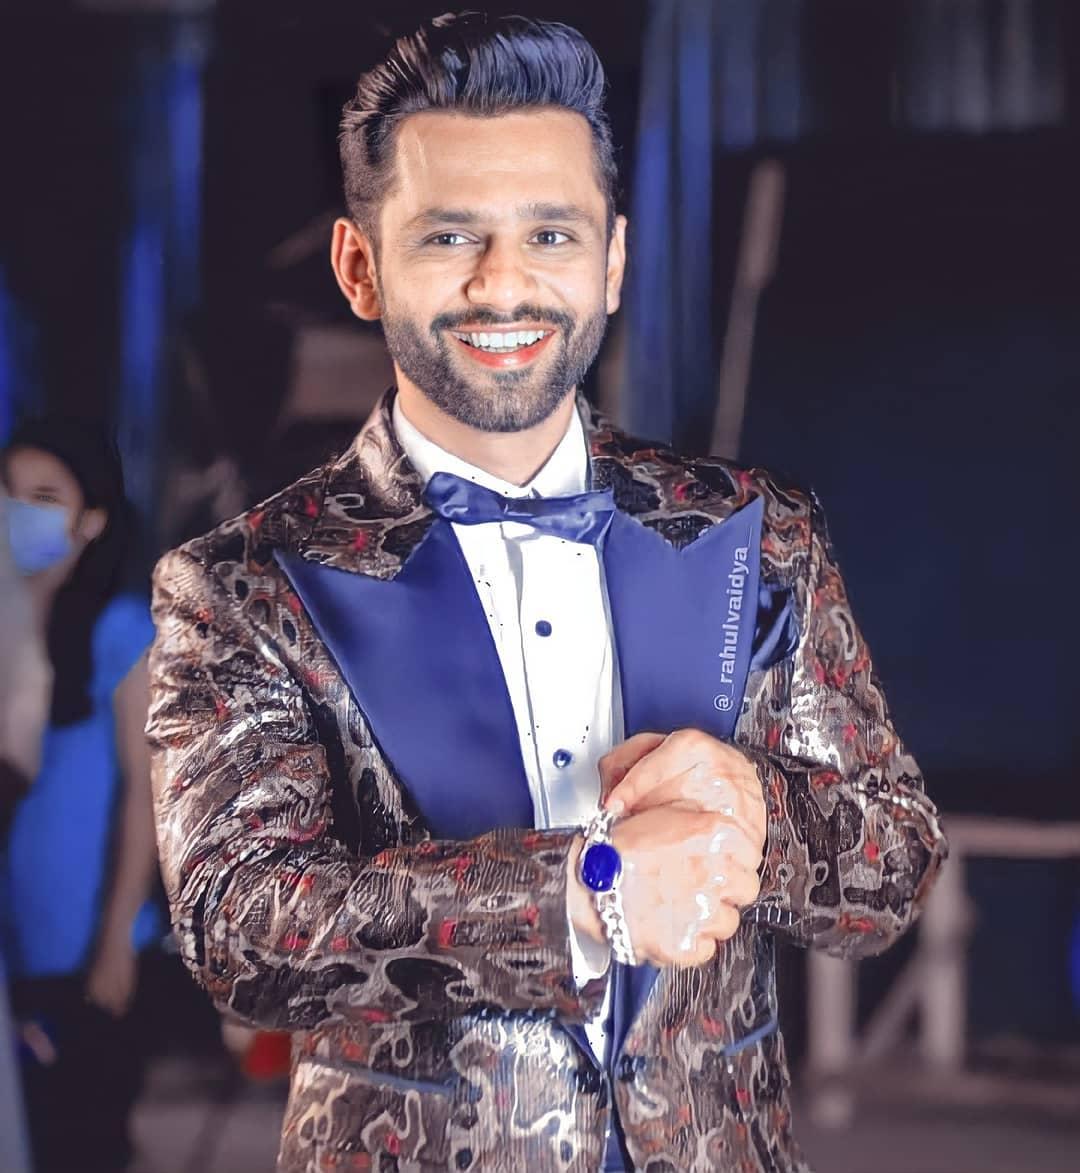 Bigg-Boss-14-Finale-Rubina-Dilaik-wins-the-trophy-Rahul-Vaidya-becomes-runner-up